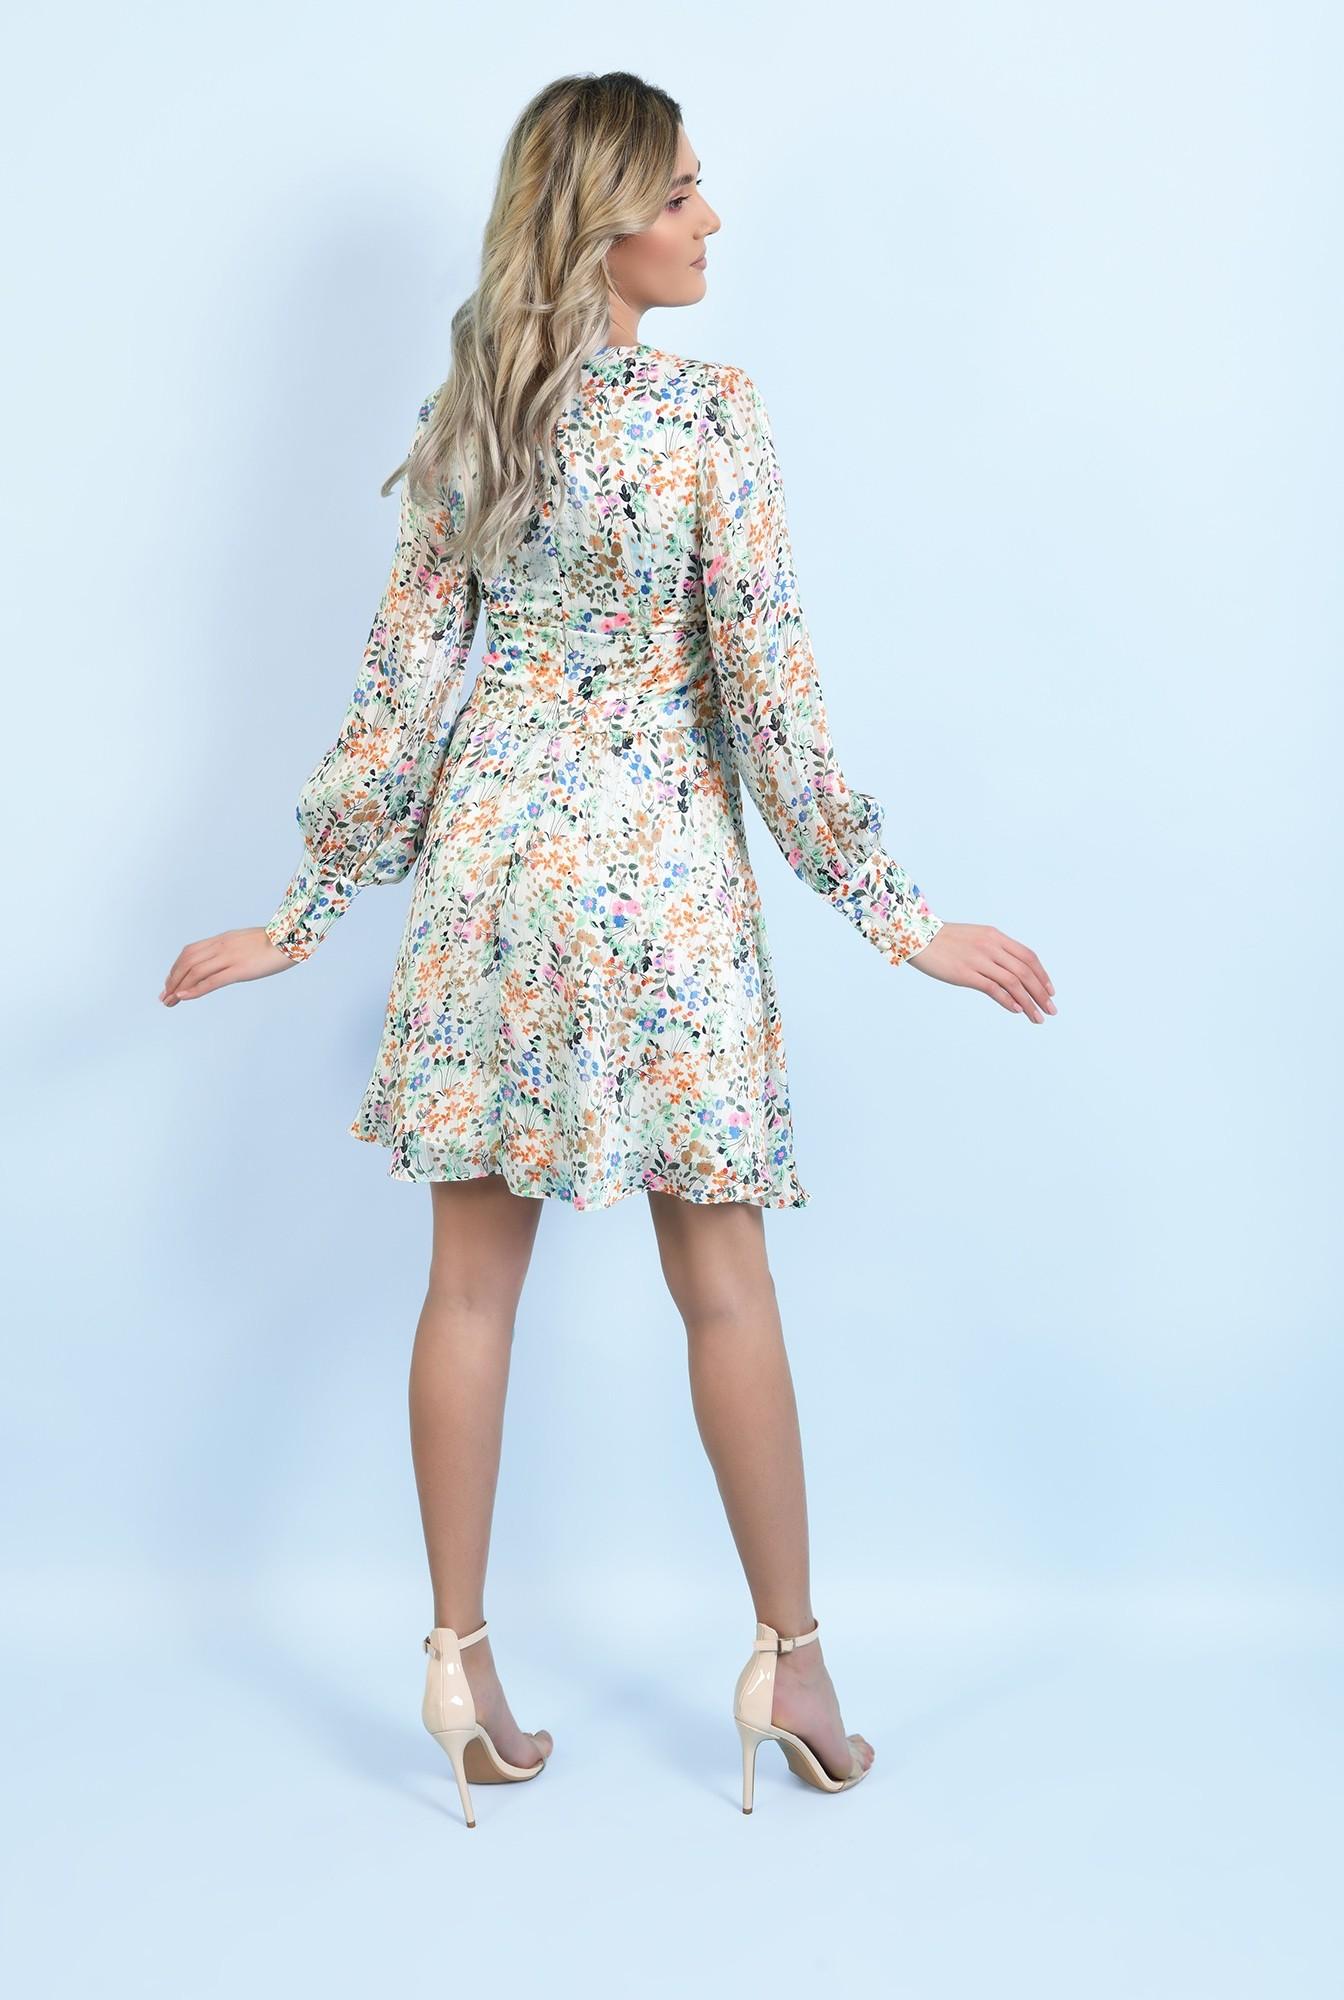 1 - 360 - rochie mini, din sifon, cu flori, maneci lungi, betelie fronsata